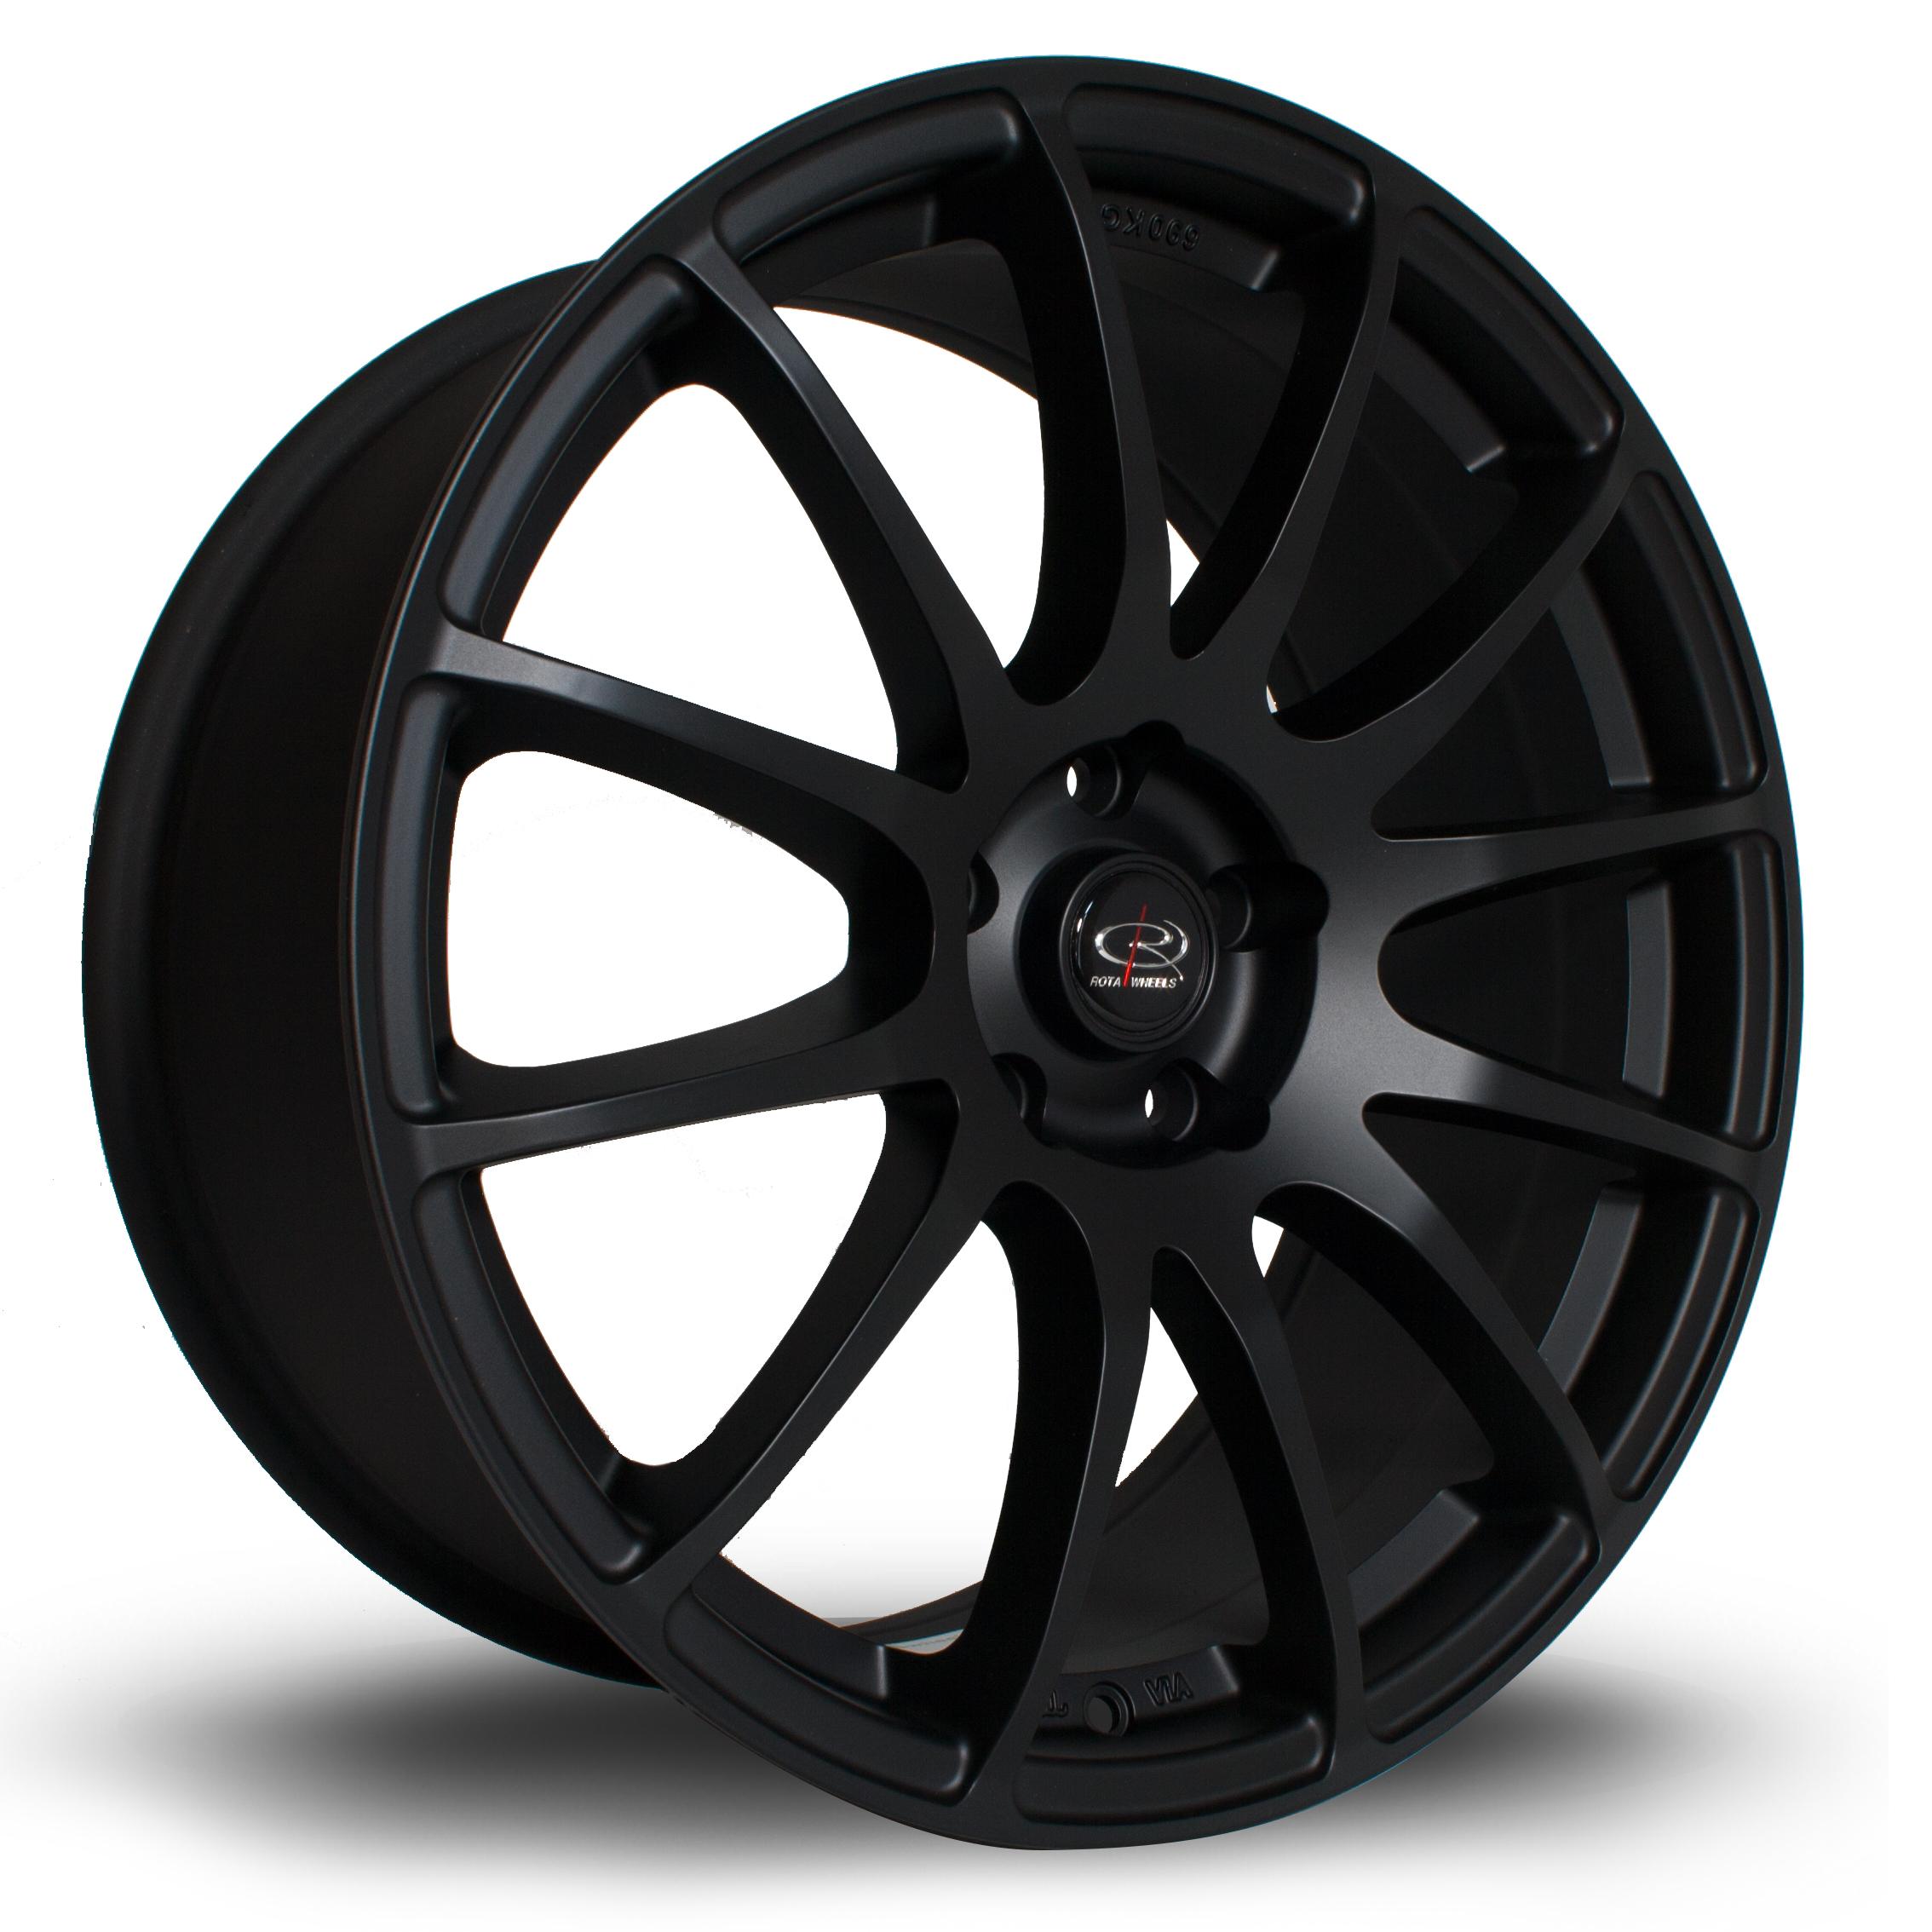 Rota PWR wheels